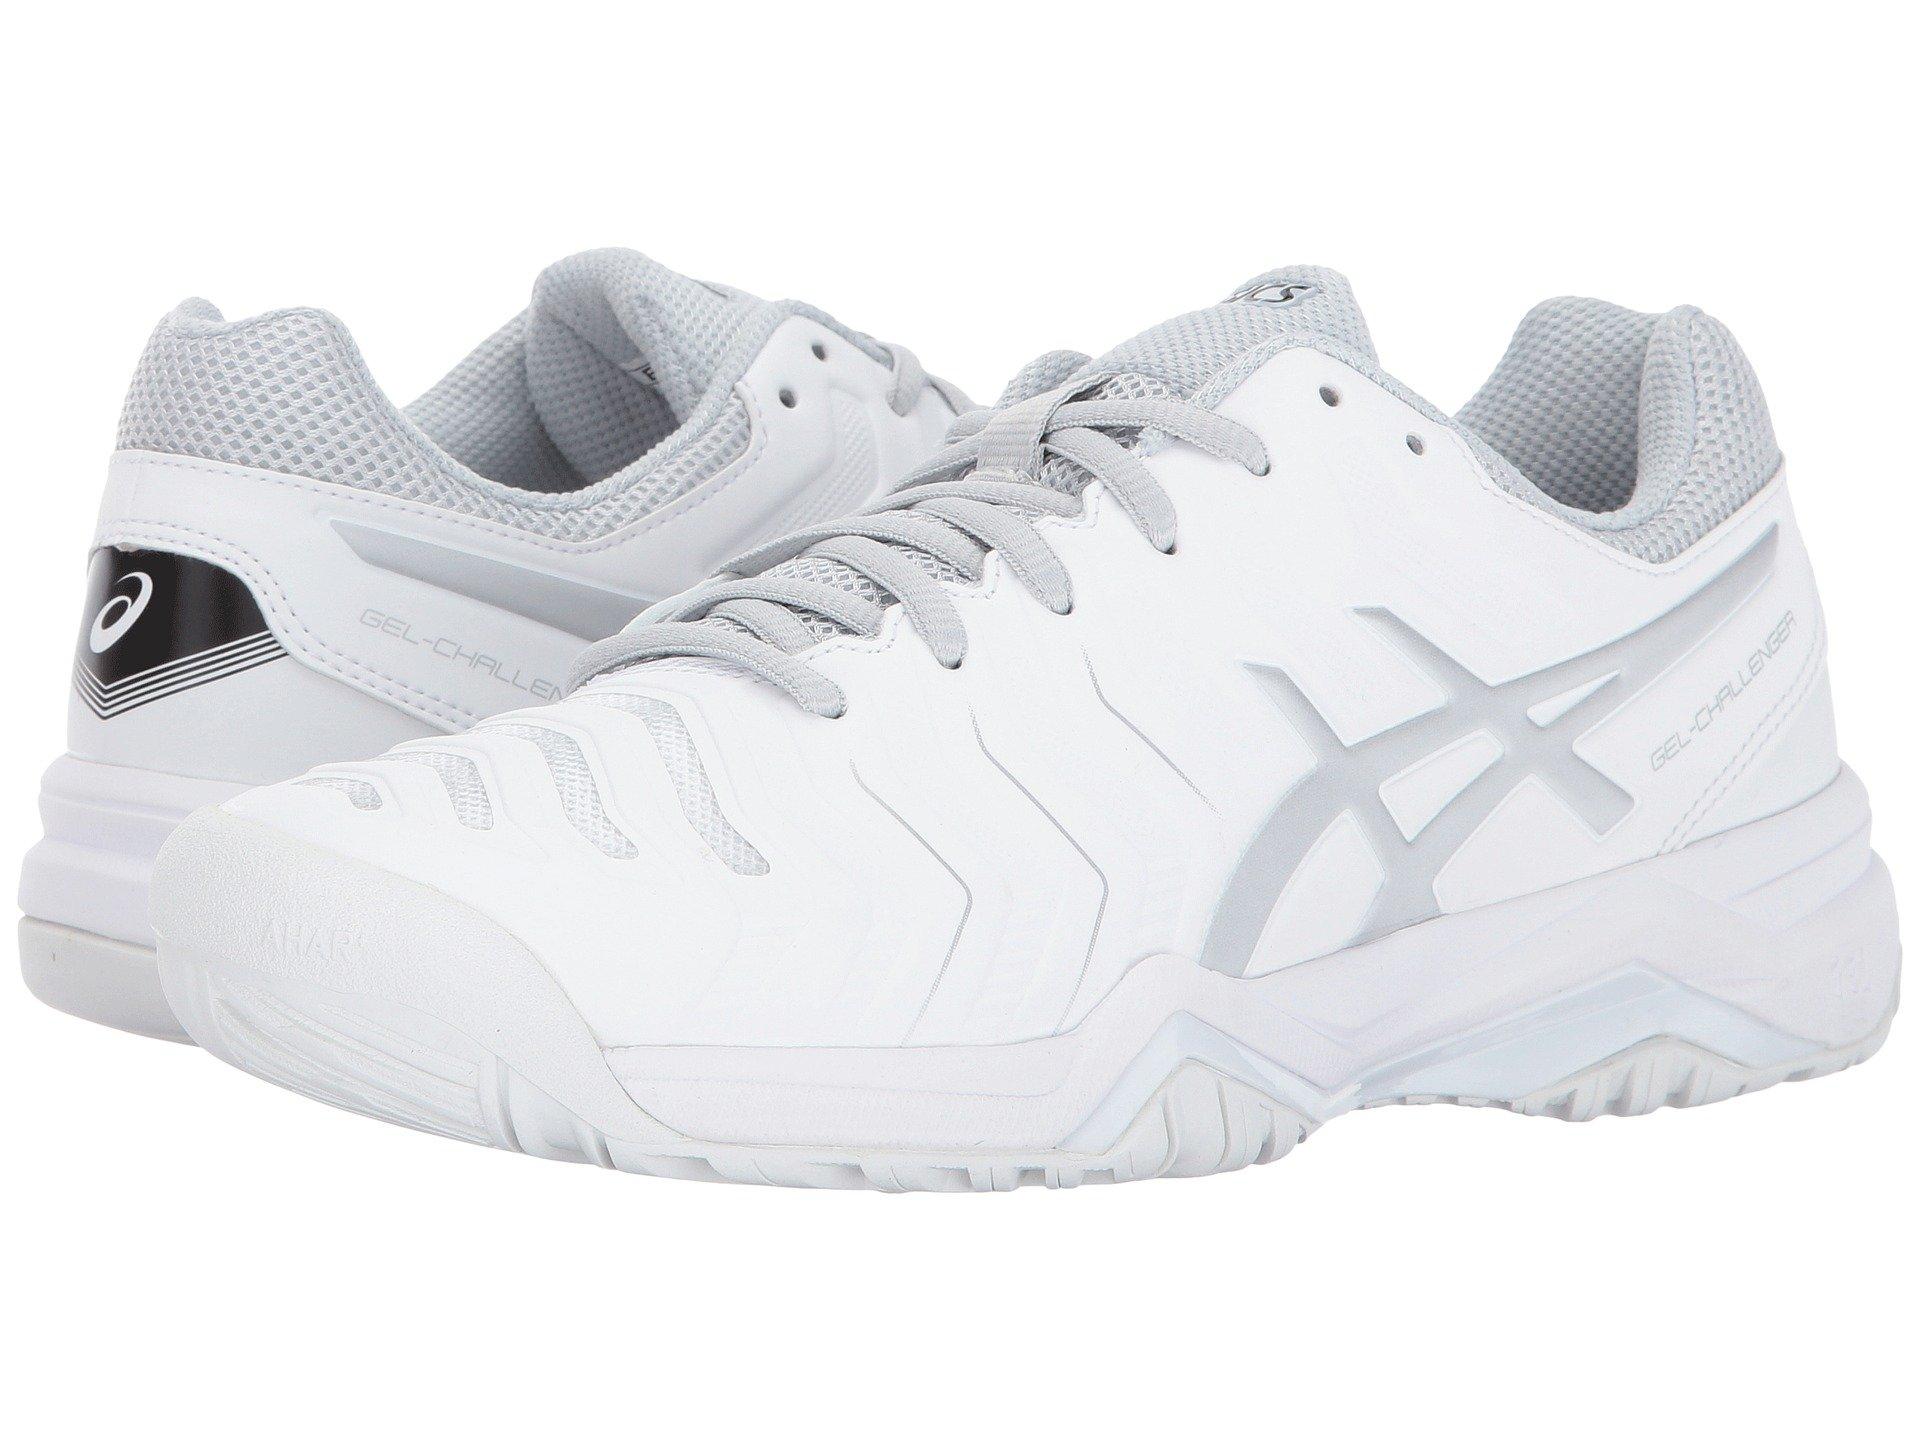 Gel Asics White 11 silver challenger RwFpdqw